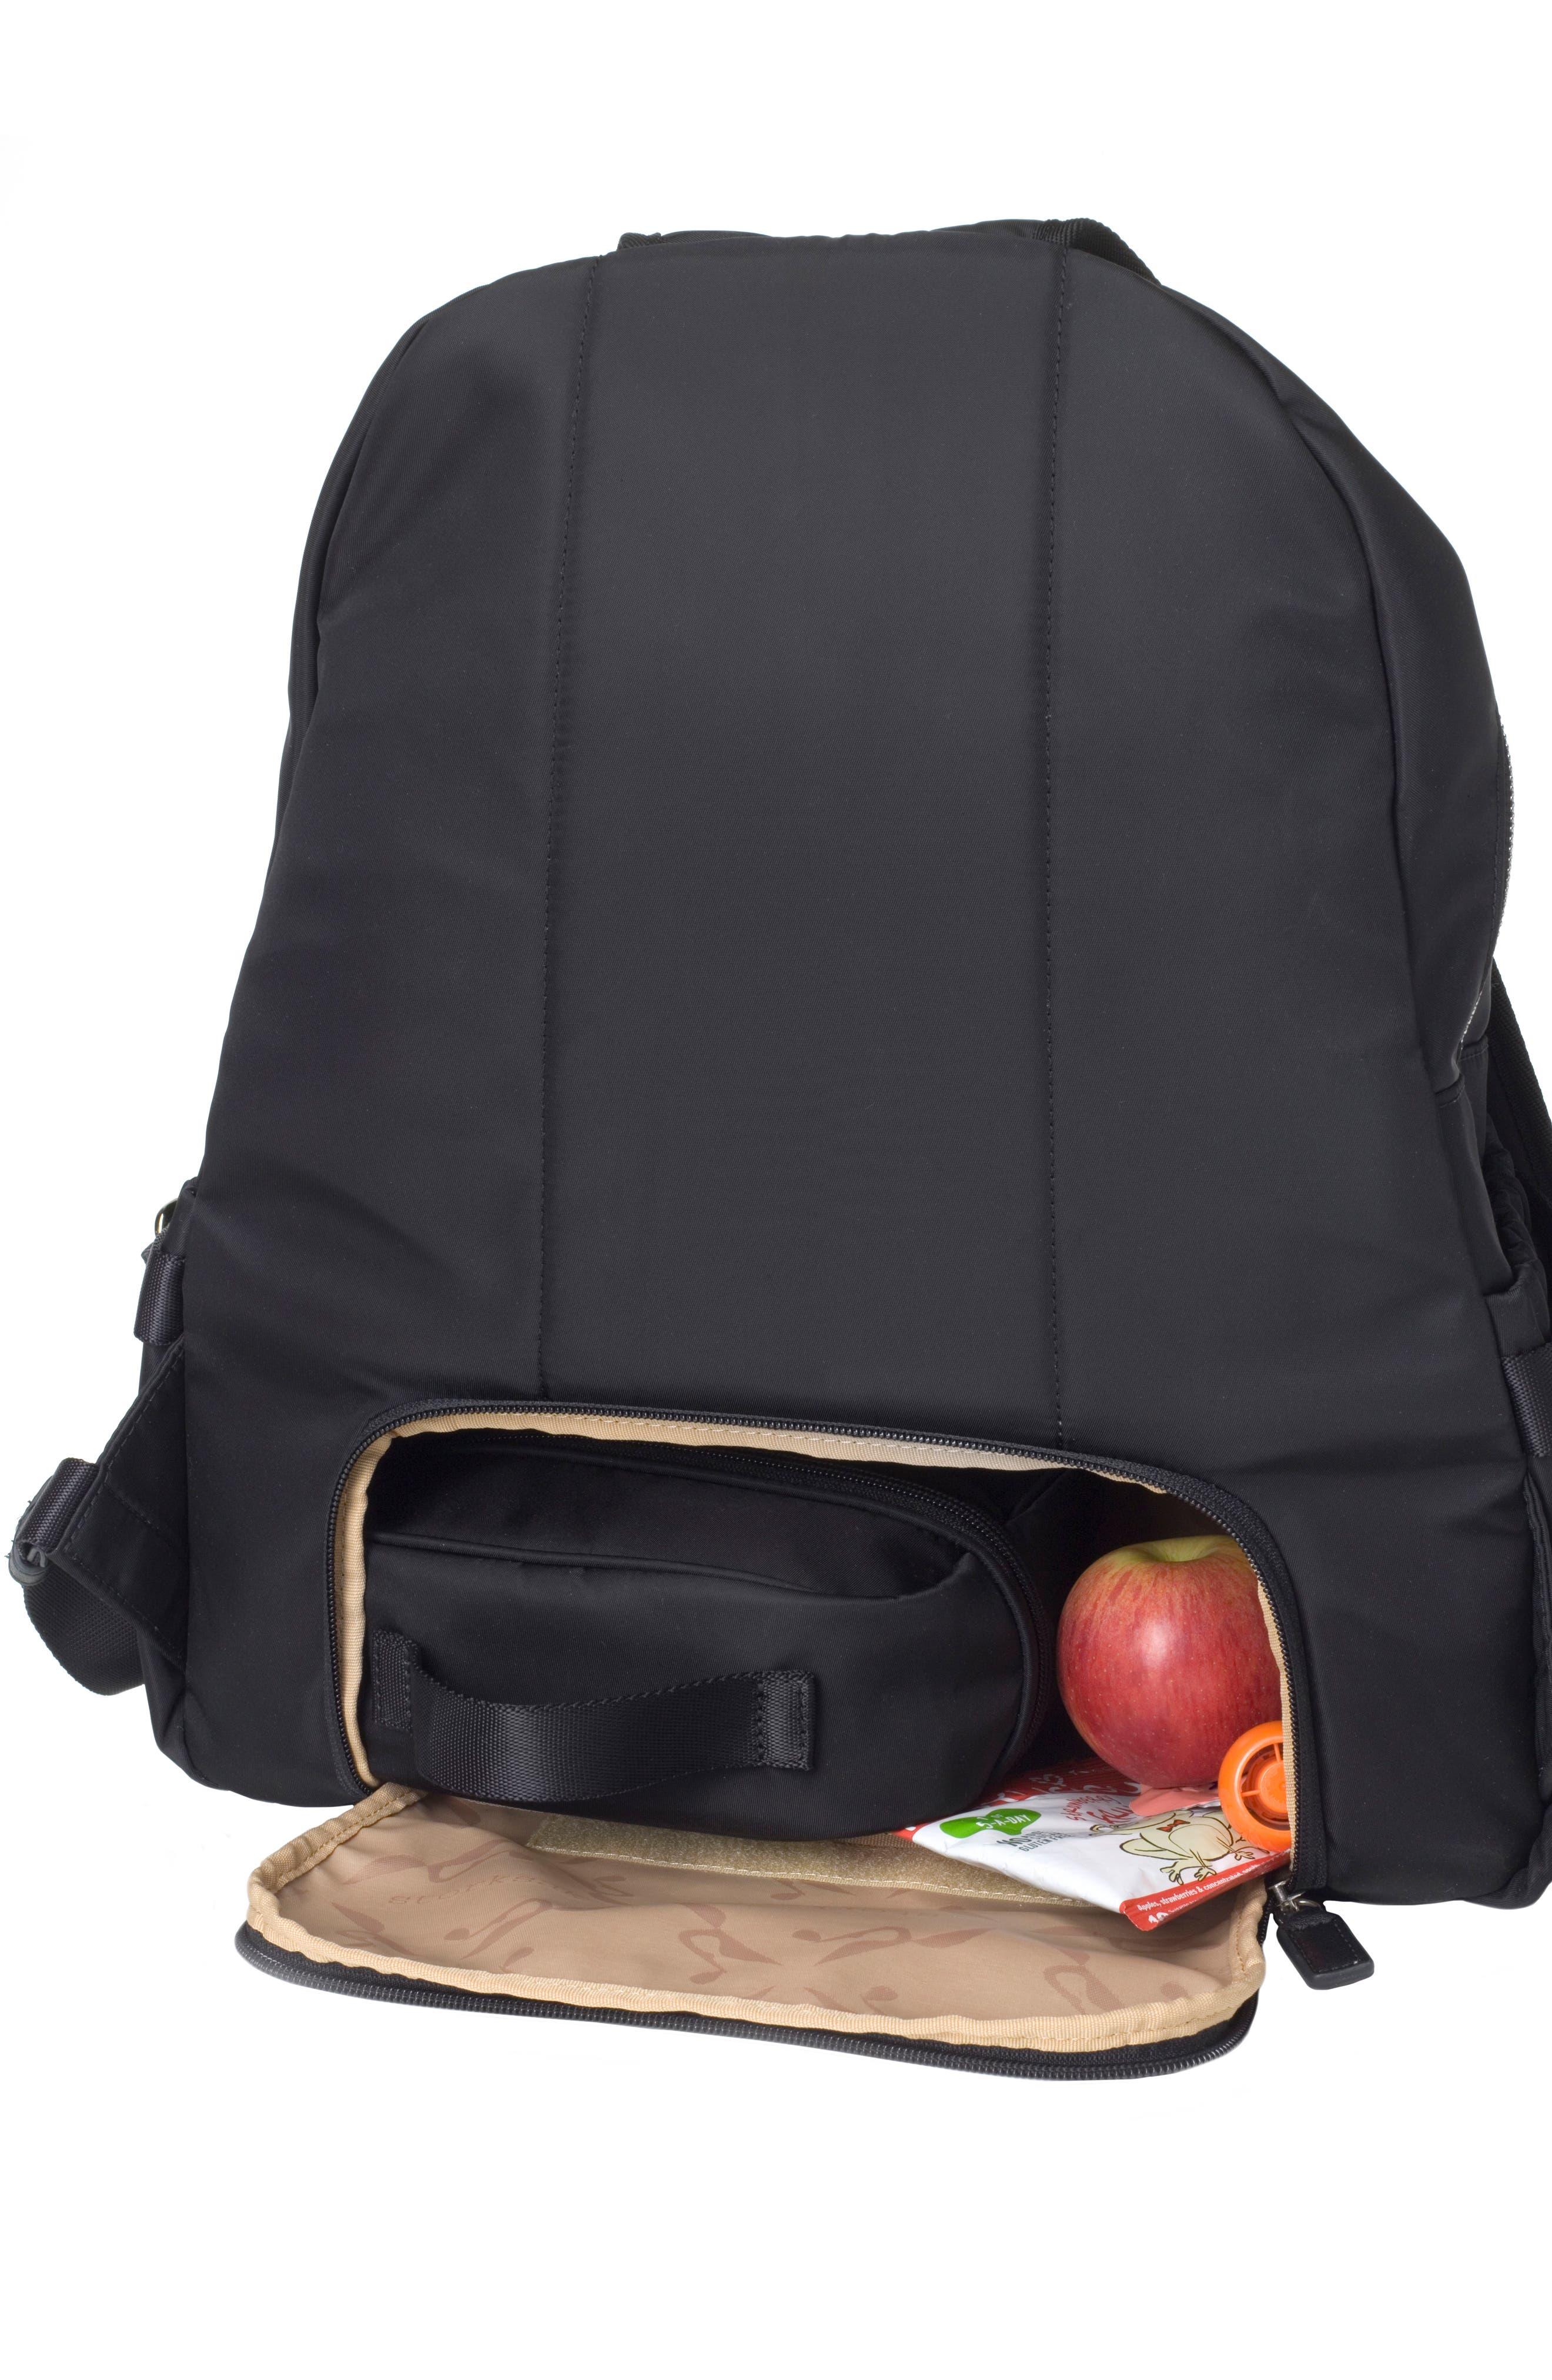 Hero Water Resistant Nylon Backpack Diaper Bag,                             Alternate thumbnail 11, color,                             BLACK